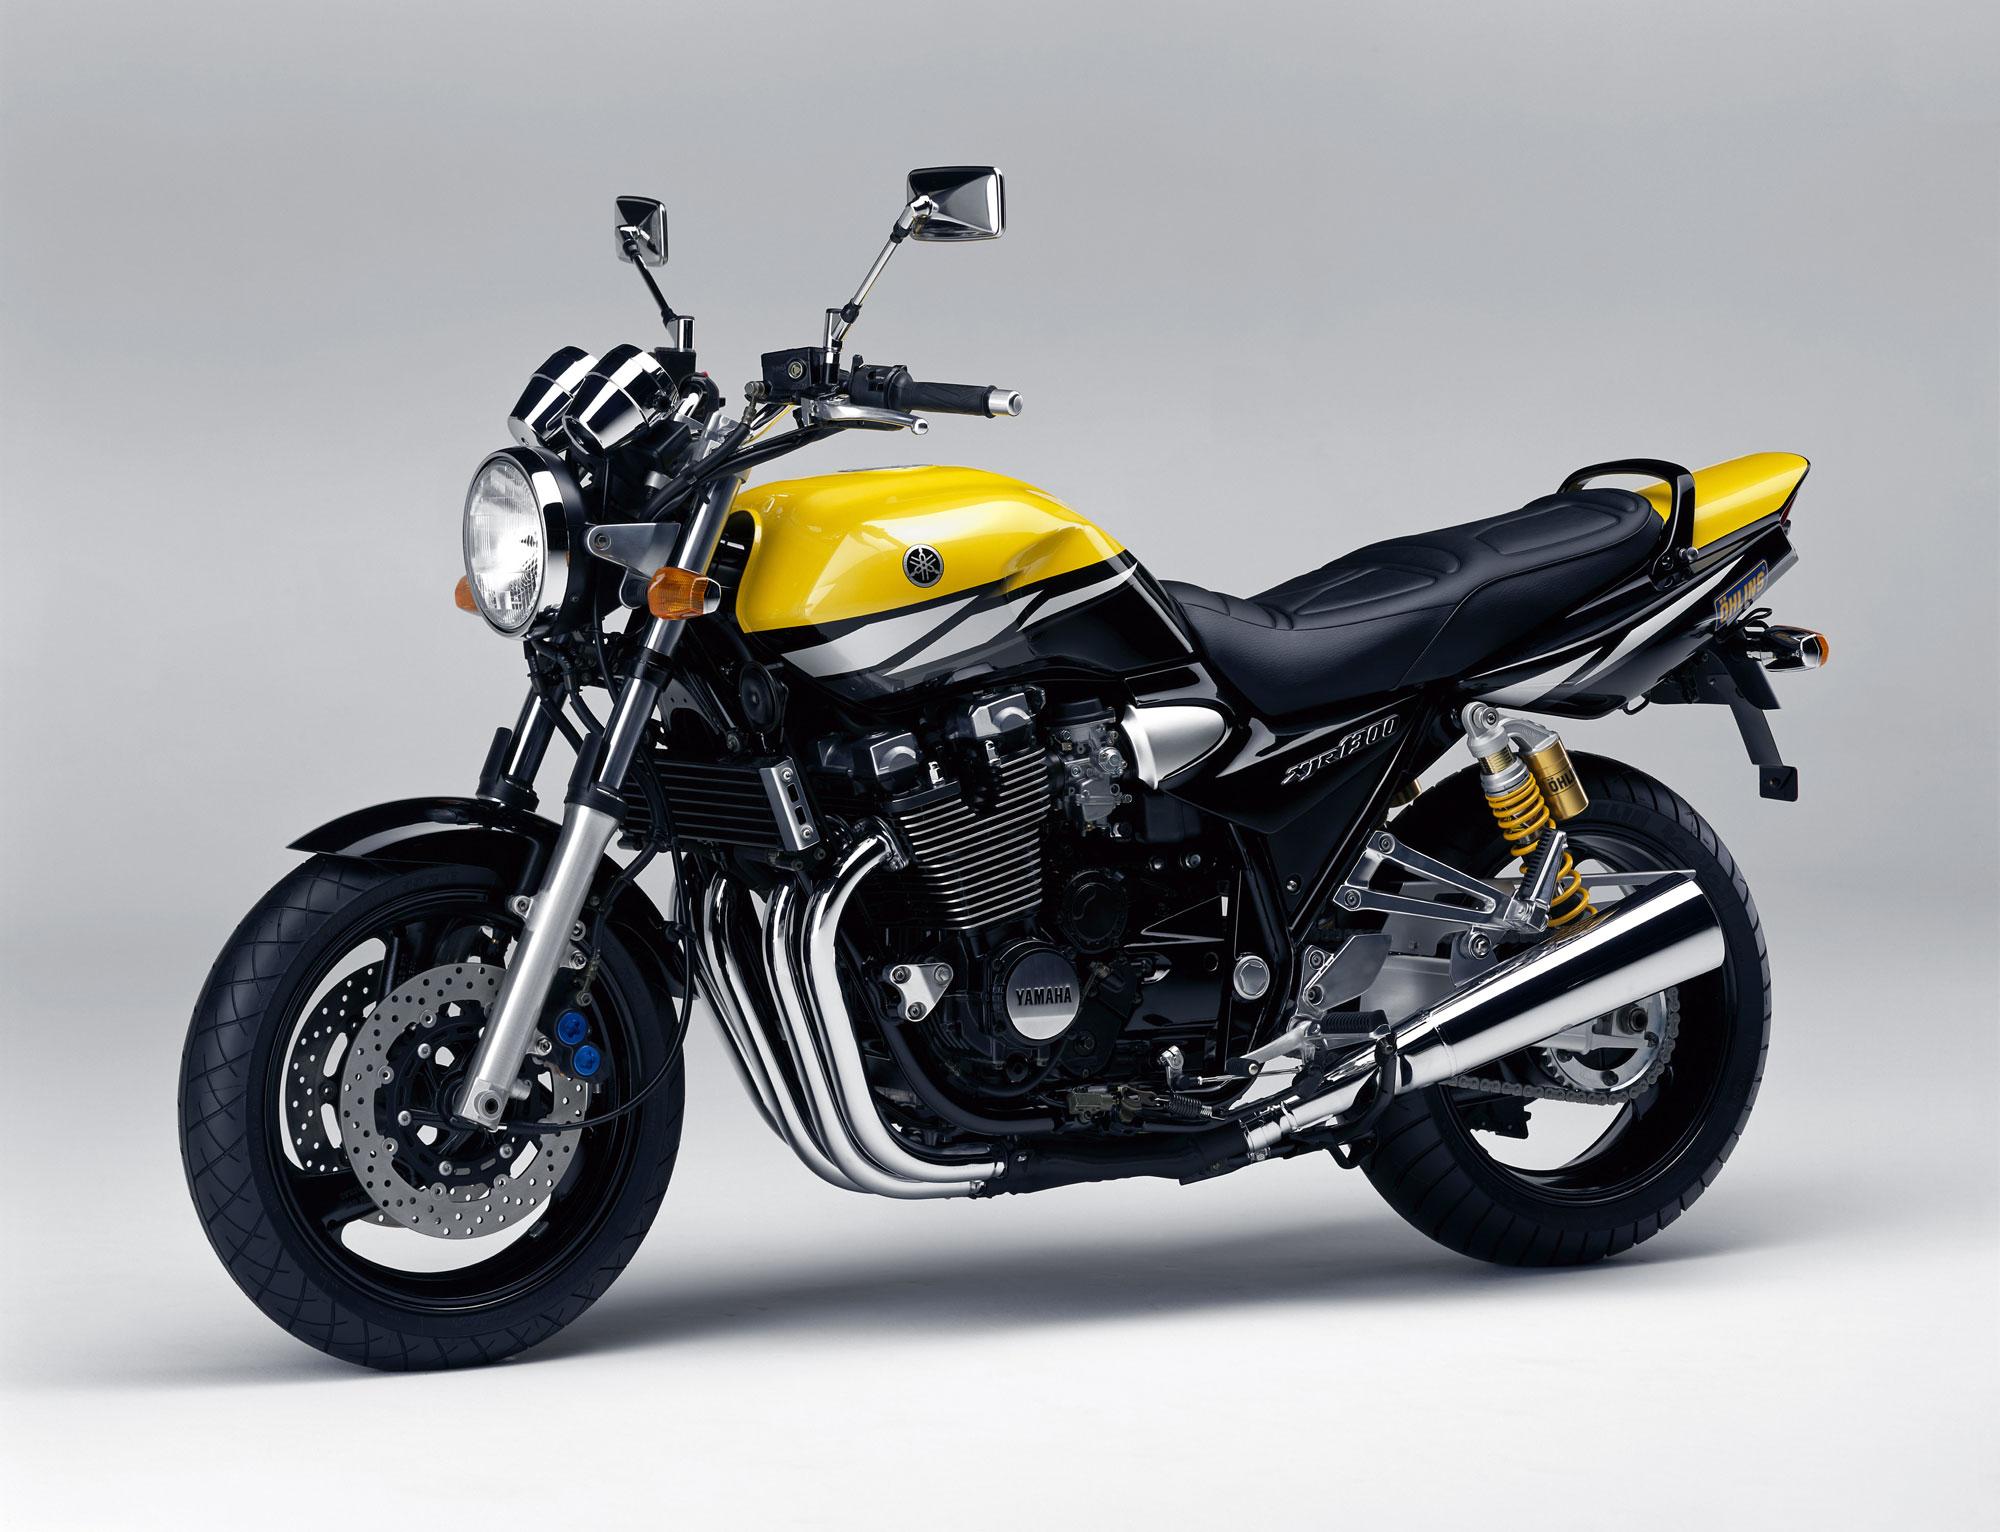 Yamaha Motorcycle Models List Philippines